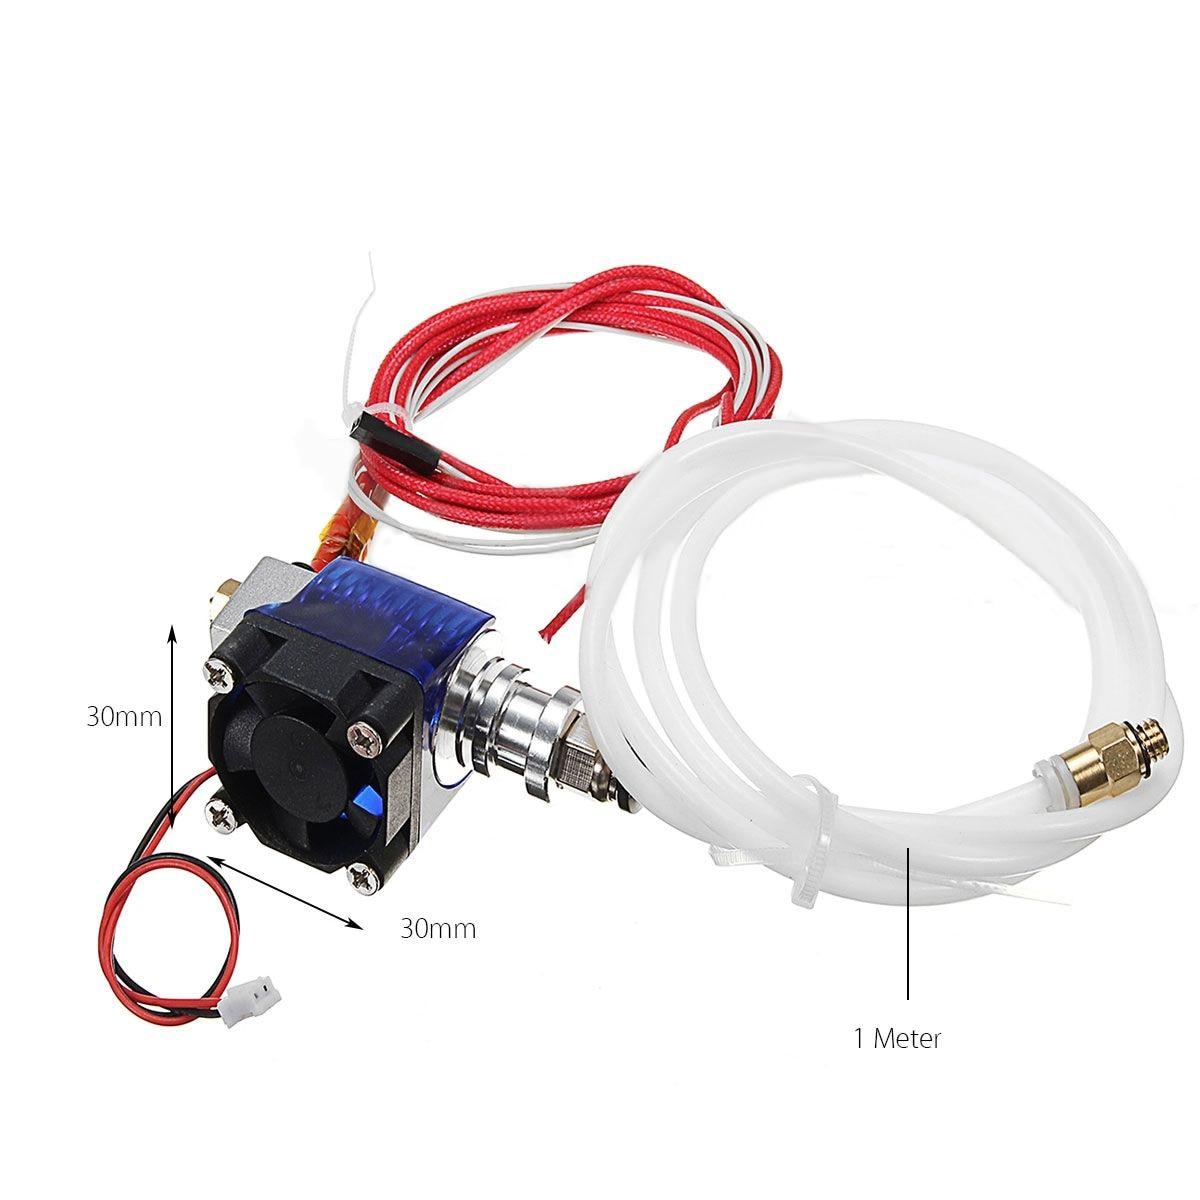 Metal 12V V6 Extruder J-head For 0.4mm 1.75mm Hotend Bowden Filament Fan 3D Printer